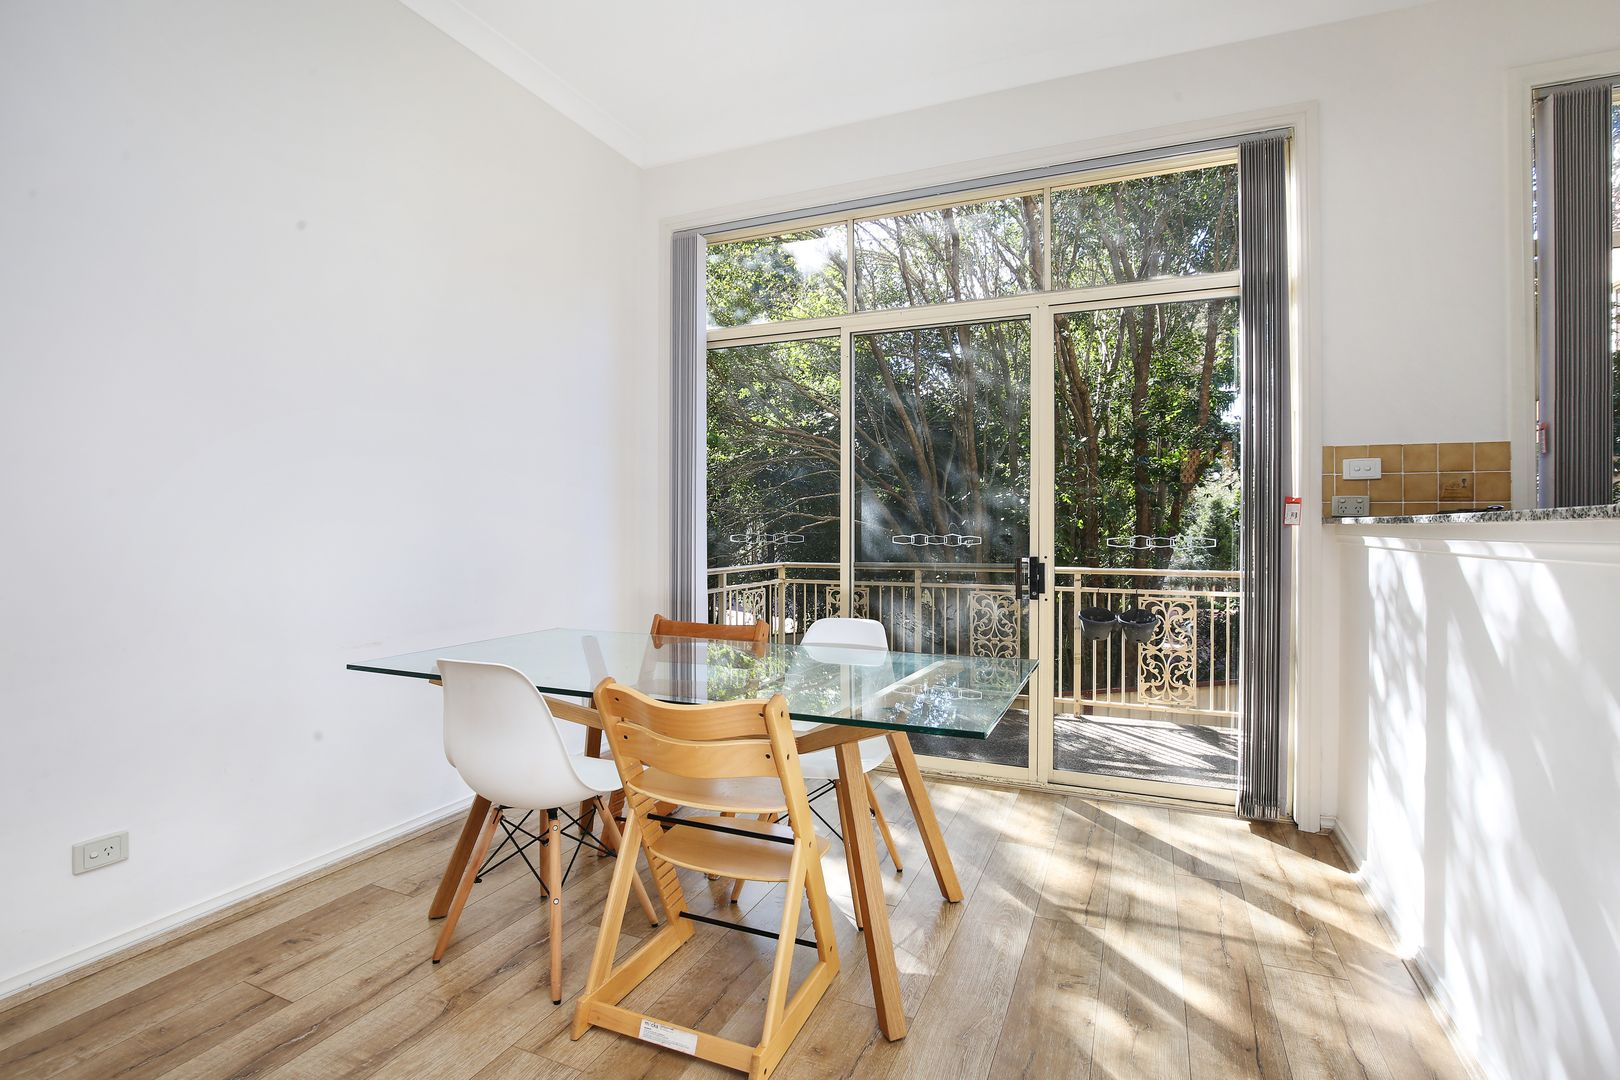 1/29 Woodlawn Avenue, Mangerton NSW 2500, Image 1